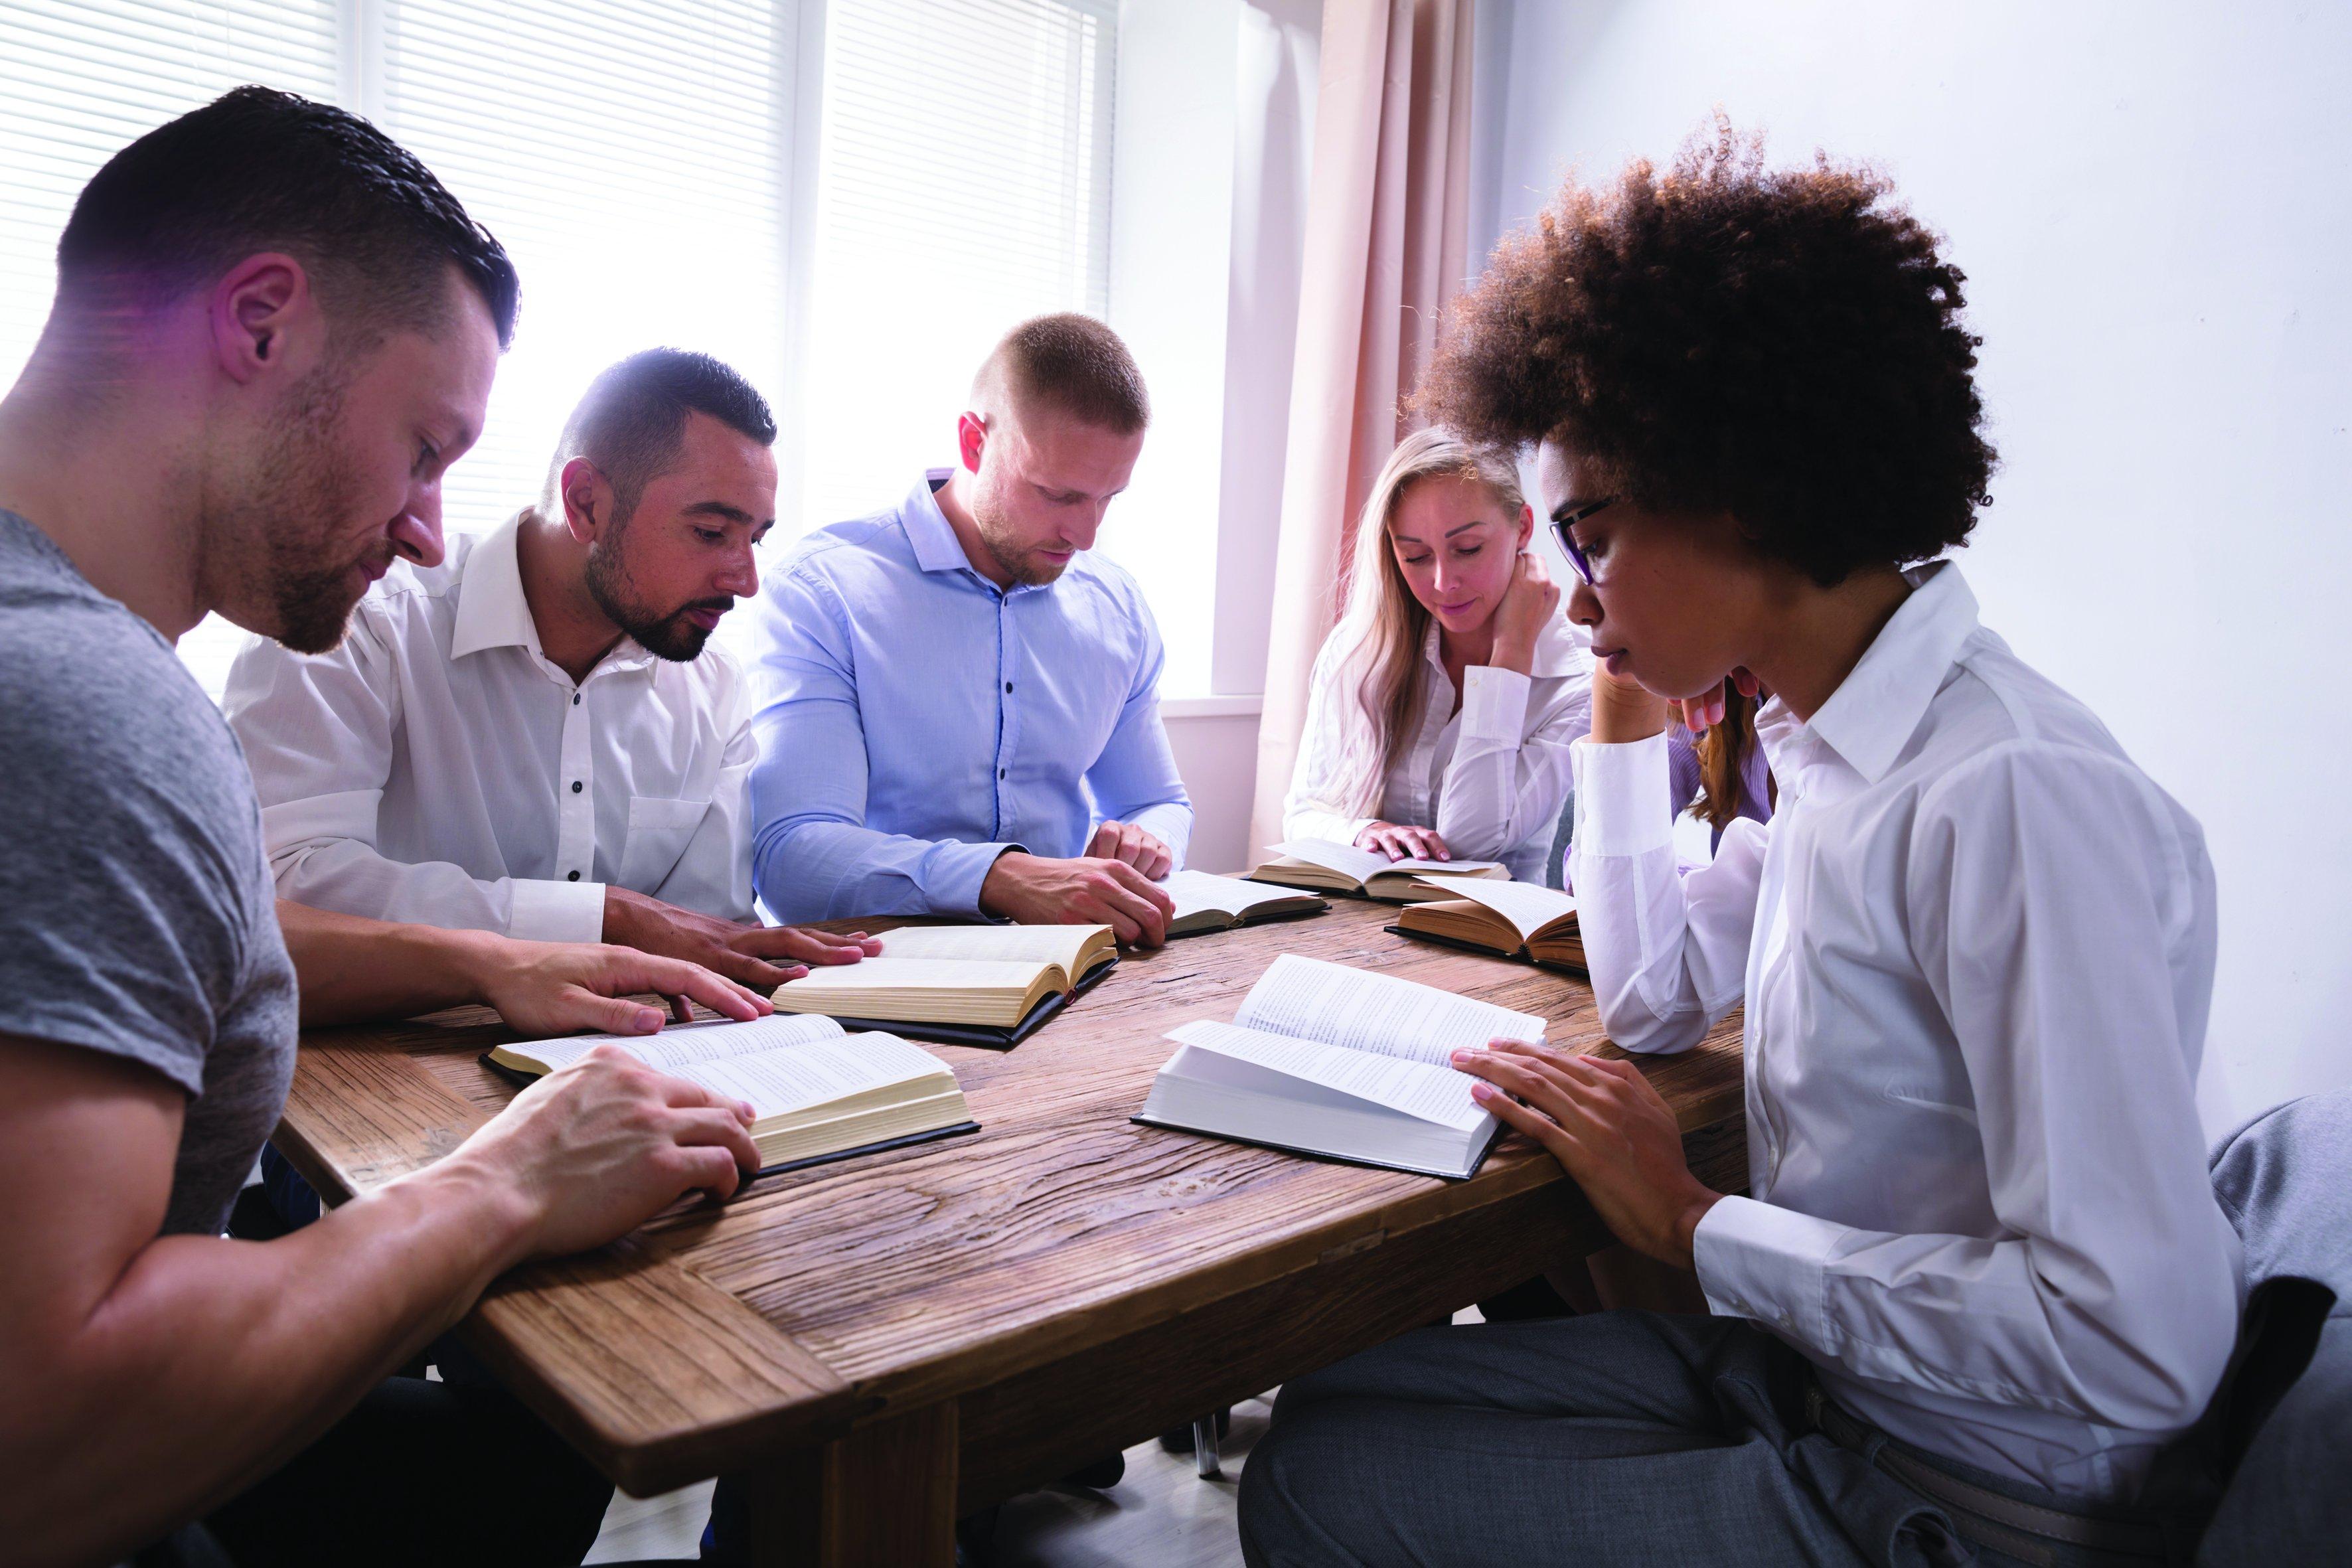 O movimento metodista e o discipulado